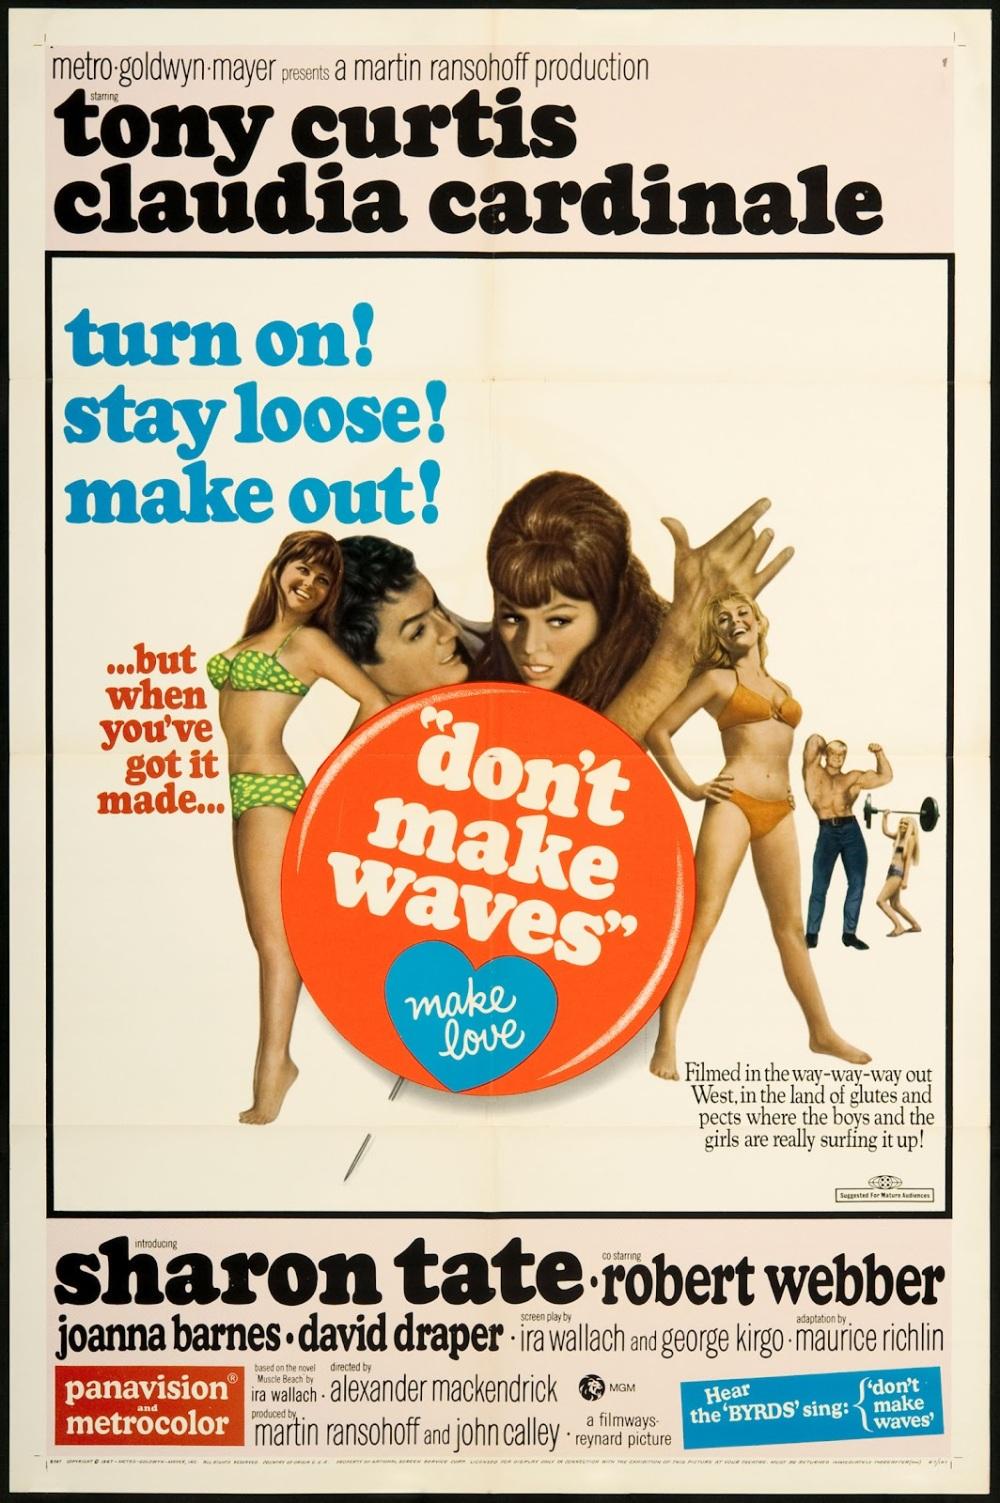 Don't make waves (1967)